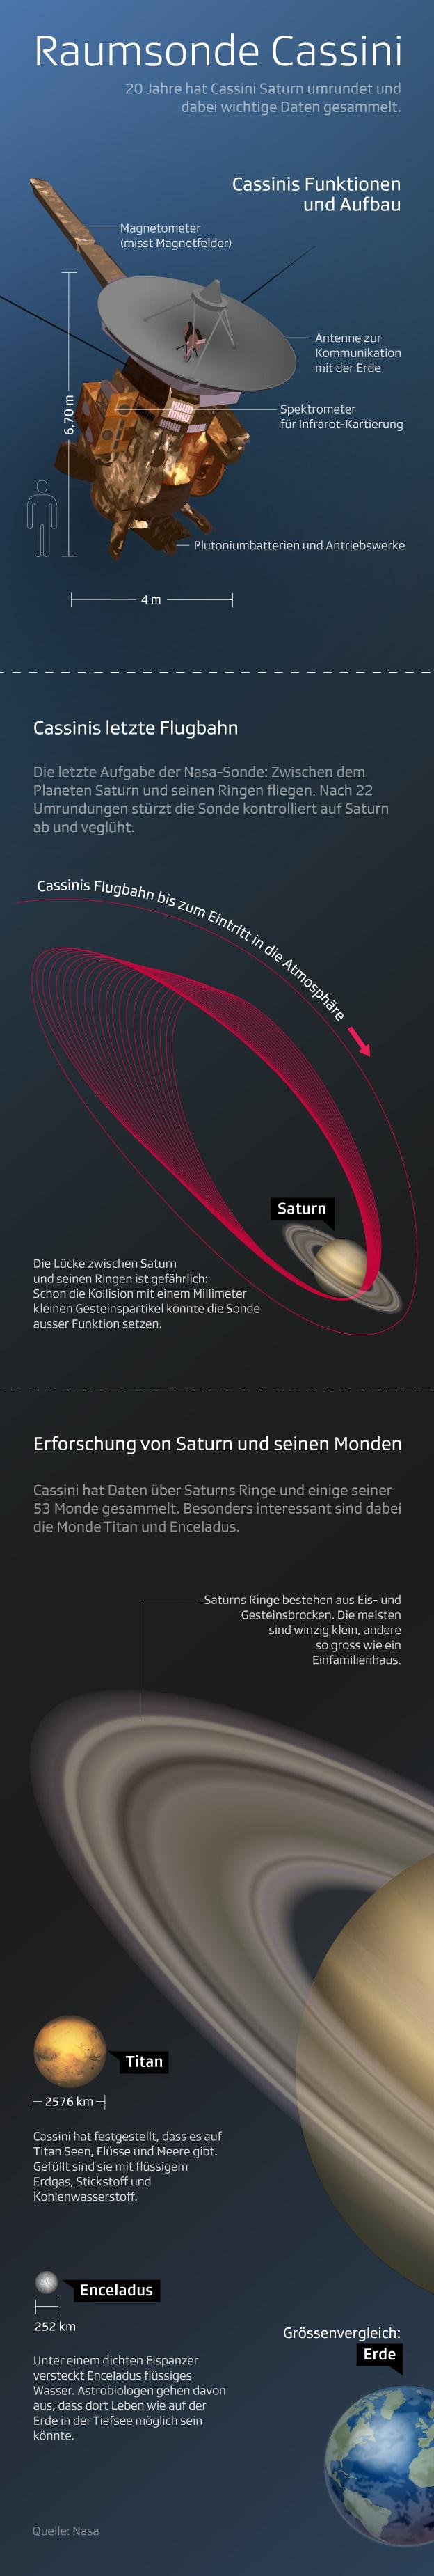 Infografik: Cassini